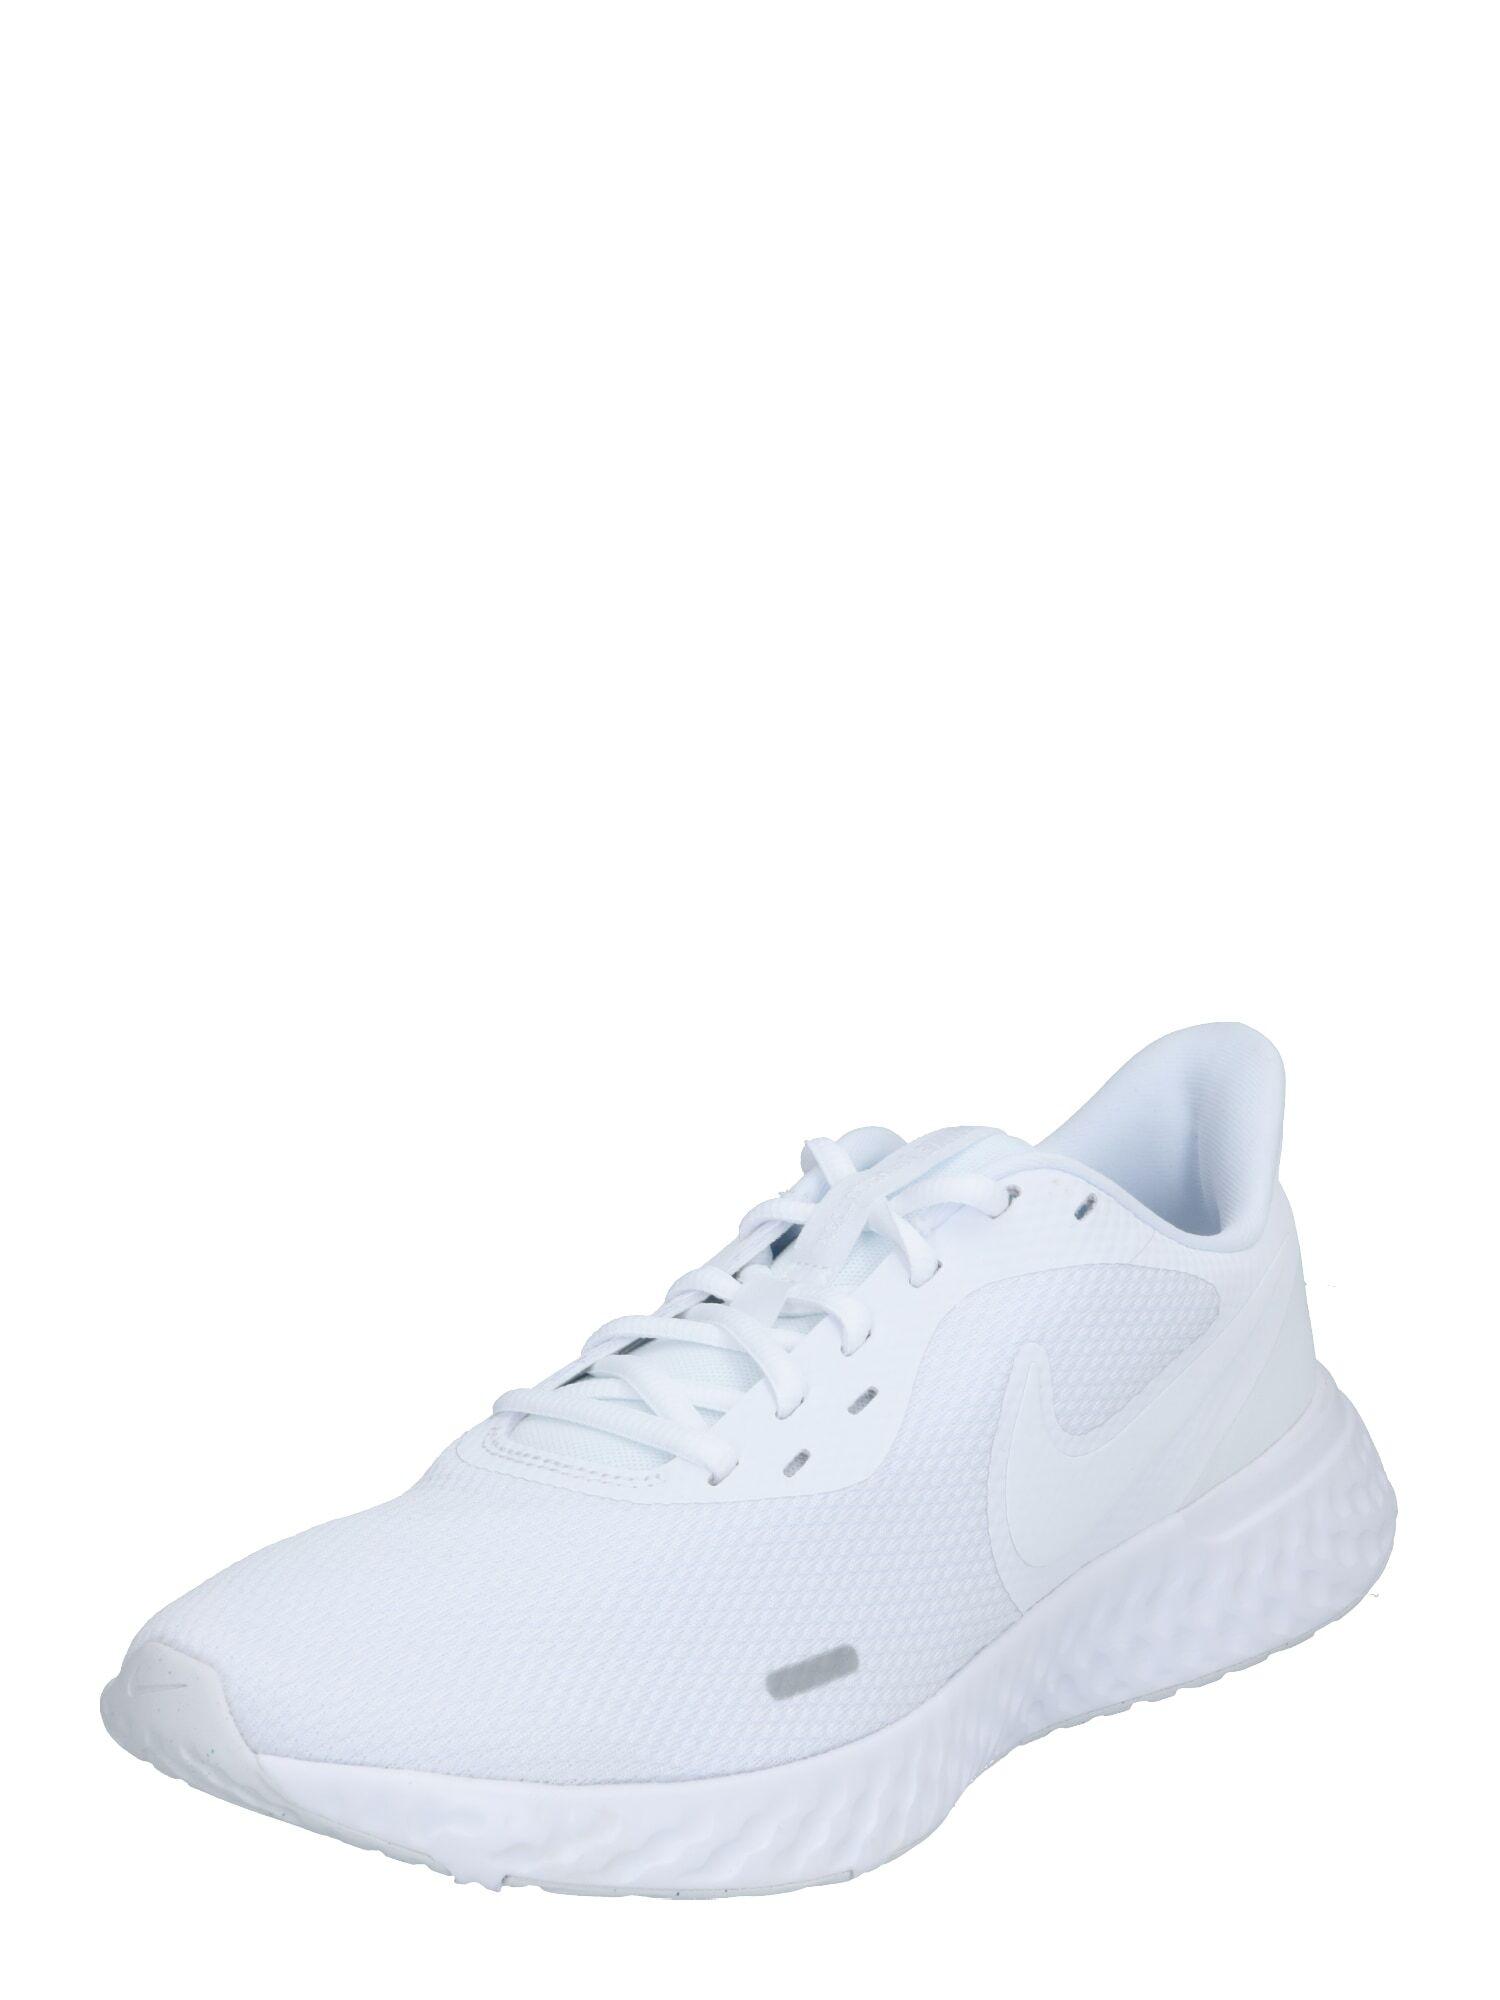 NIKE Chaussure de course 'Revolution 5'  - Blanc - Taille: 11.5 - male